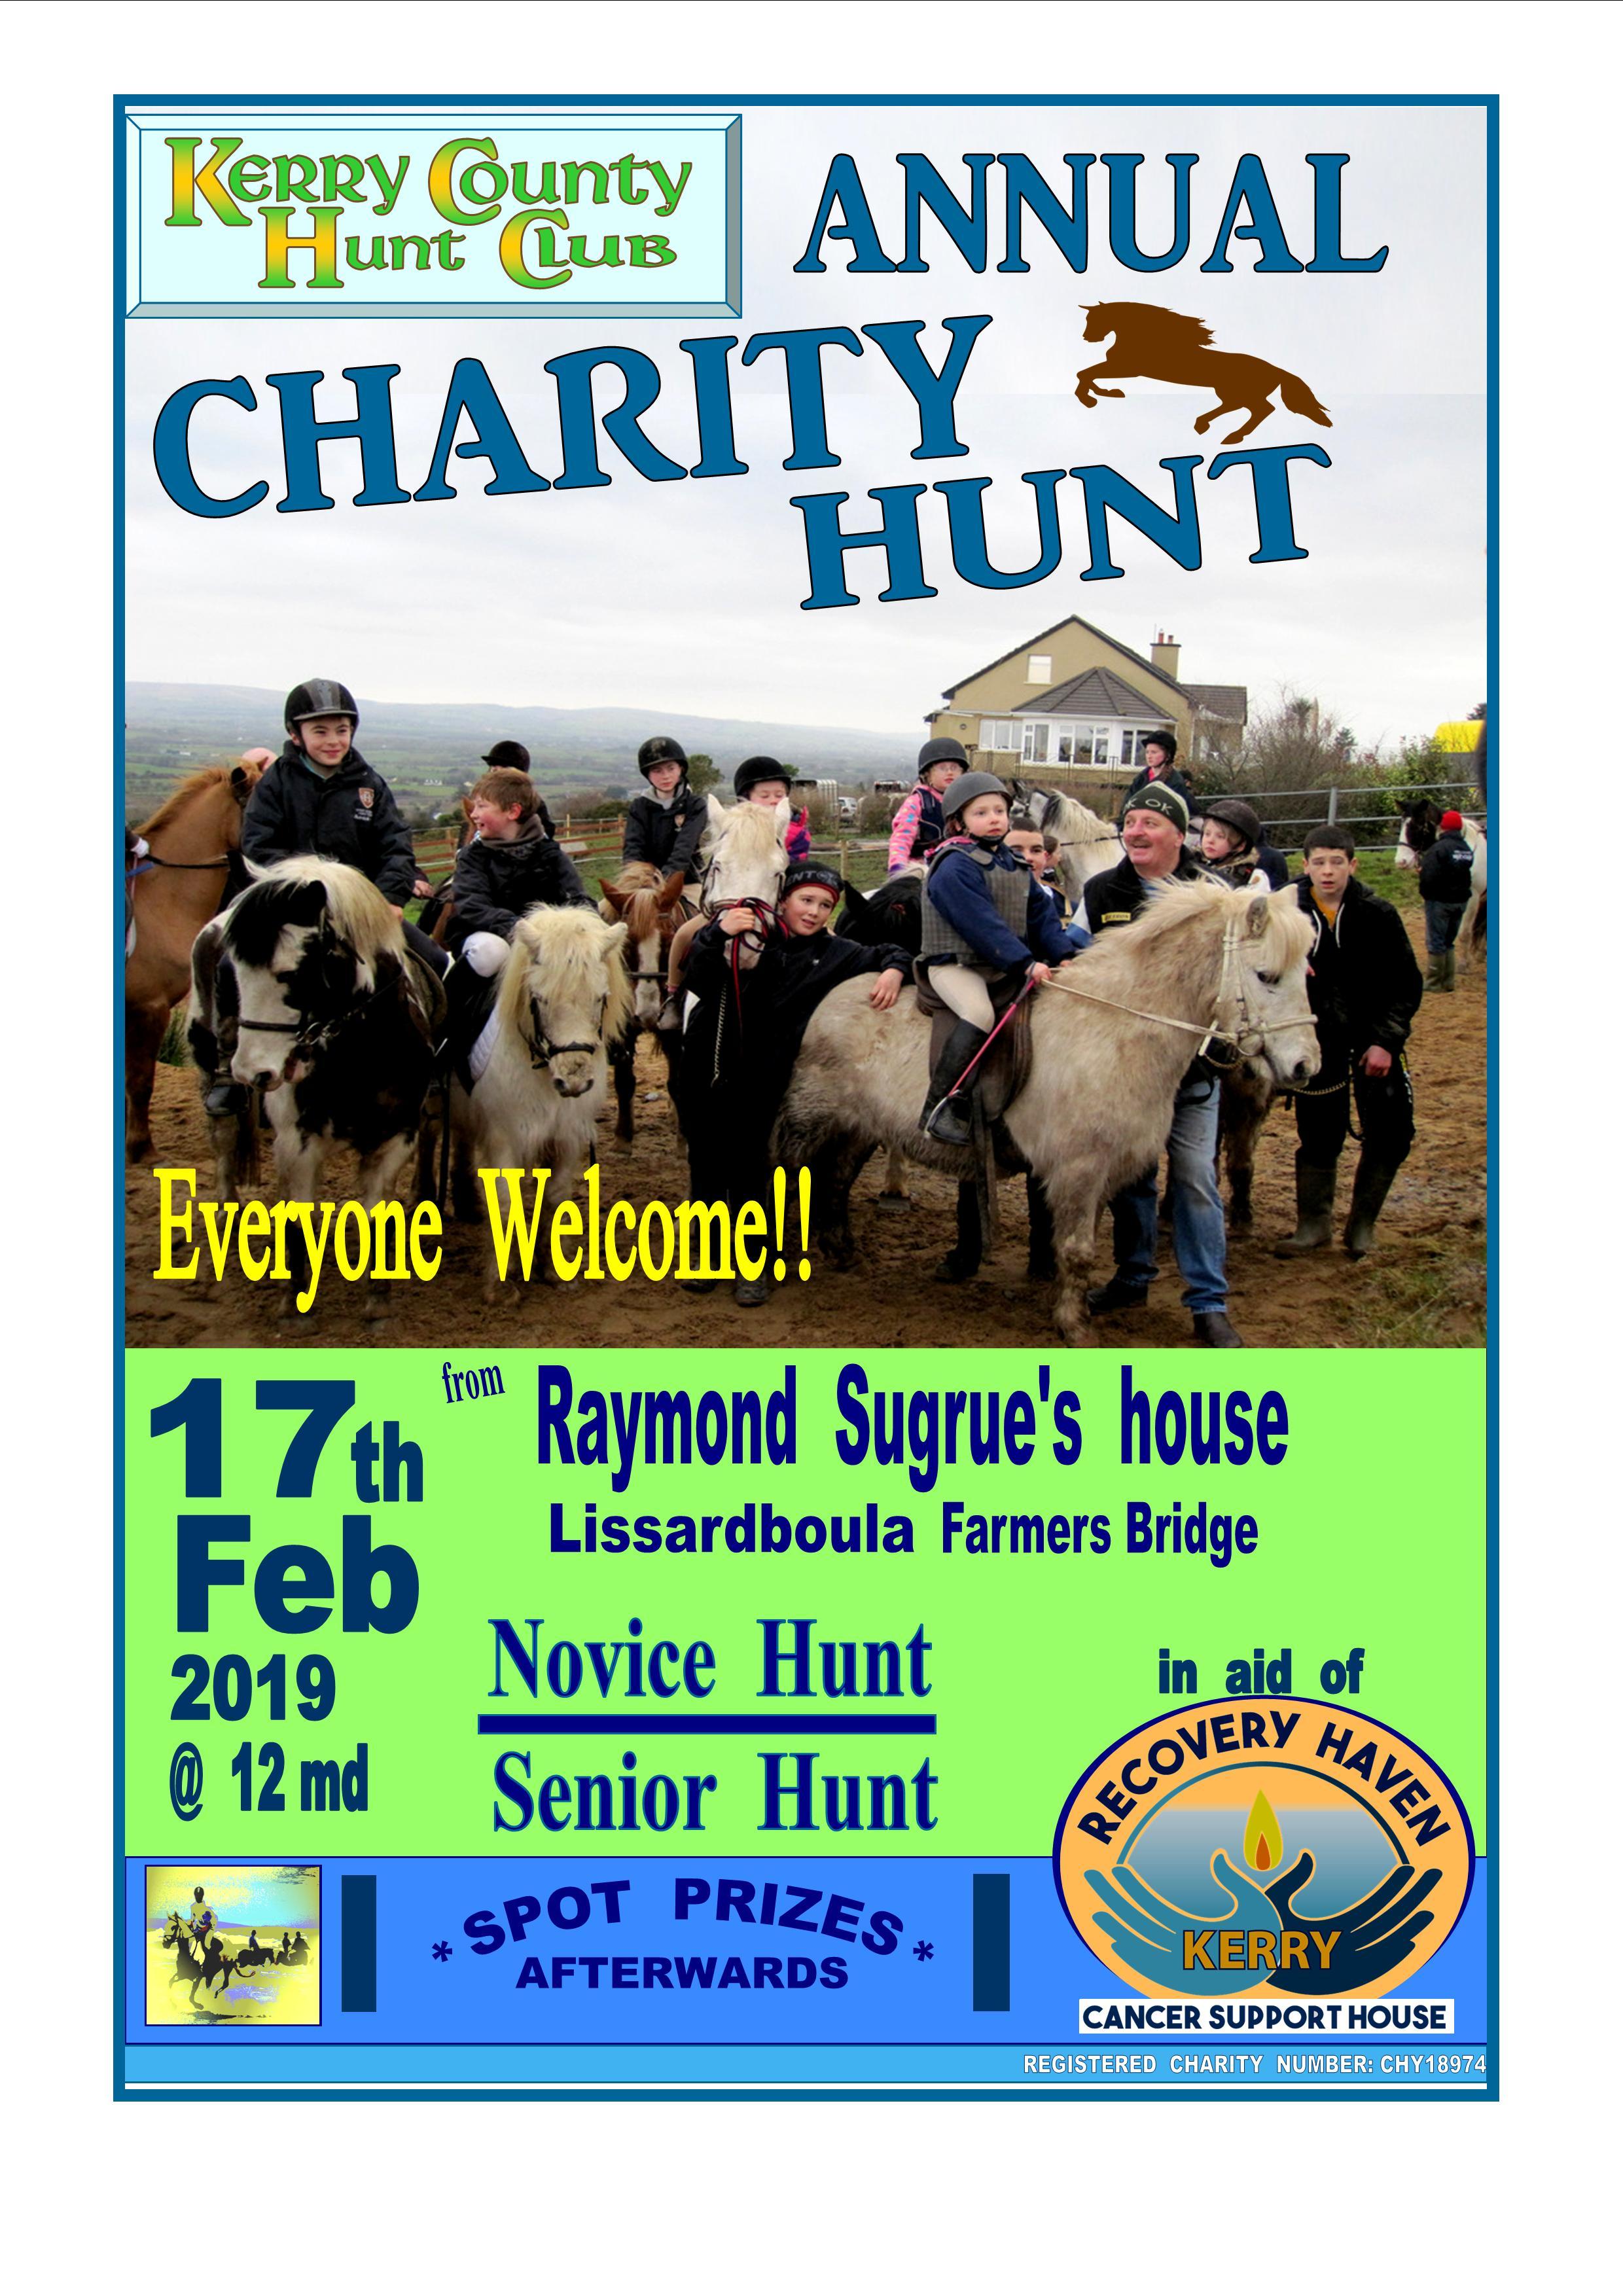 Charity Hunt 2019